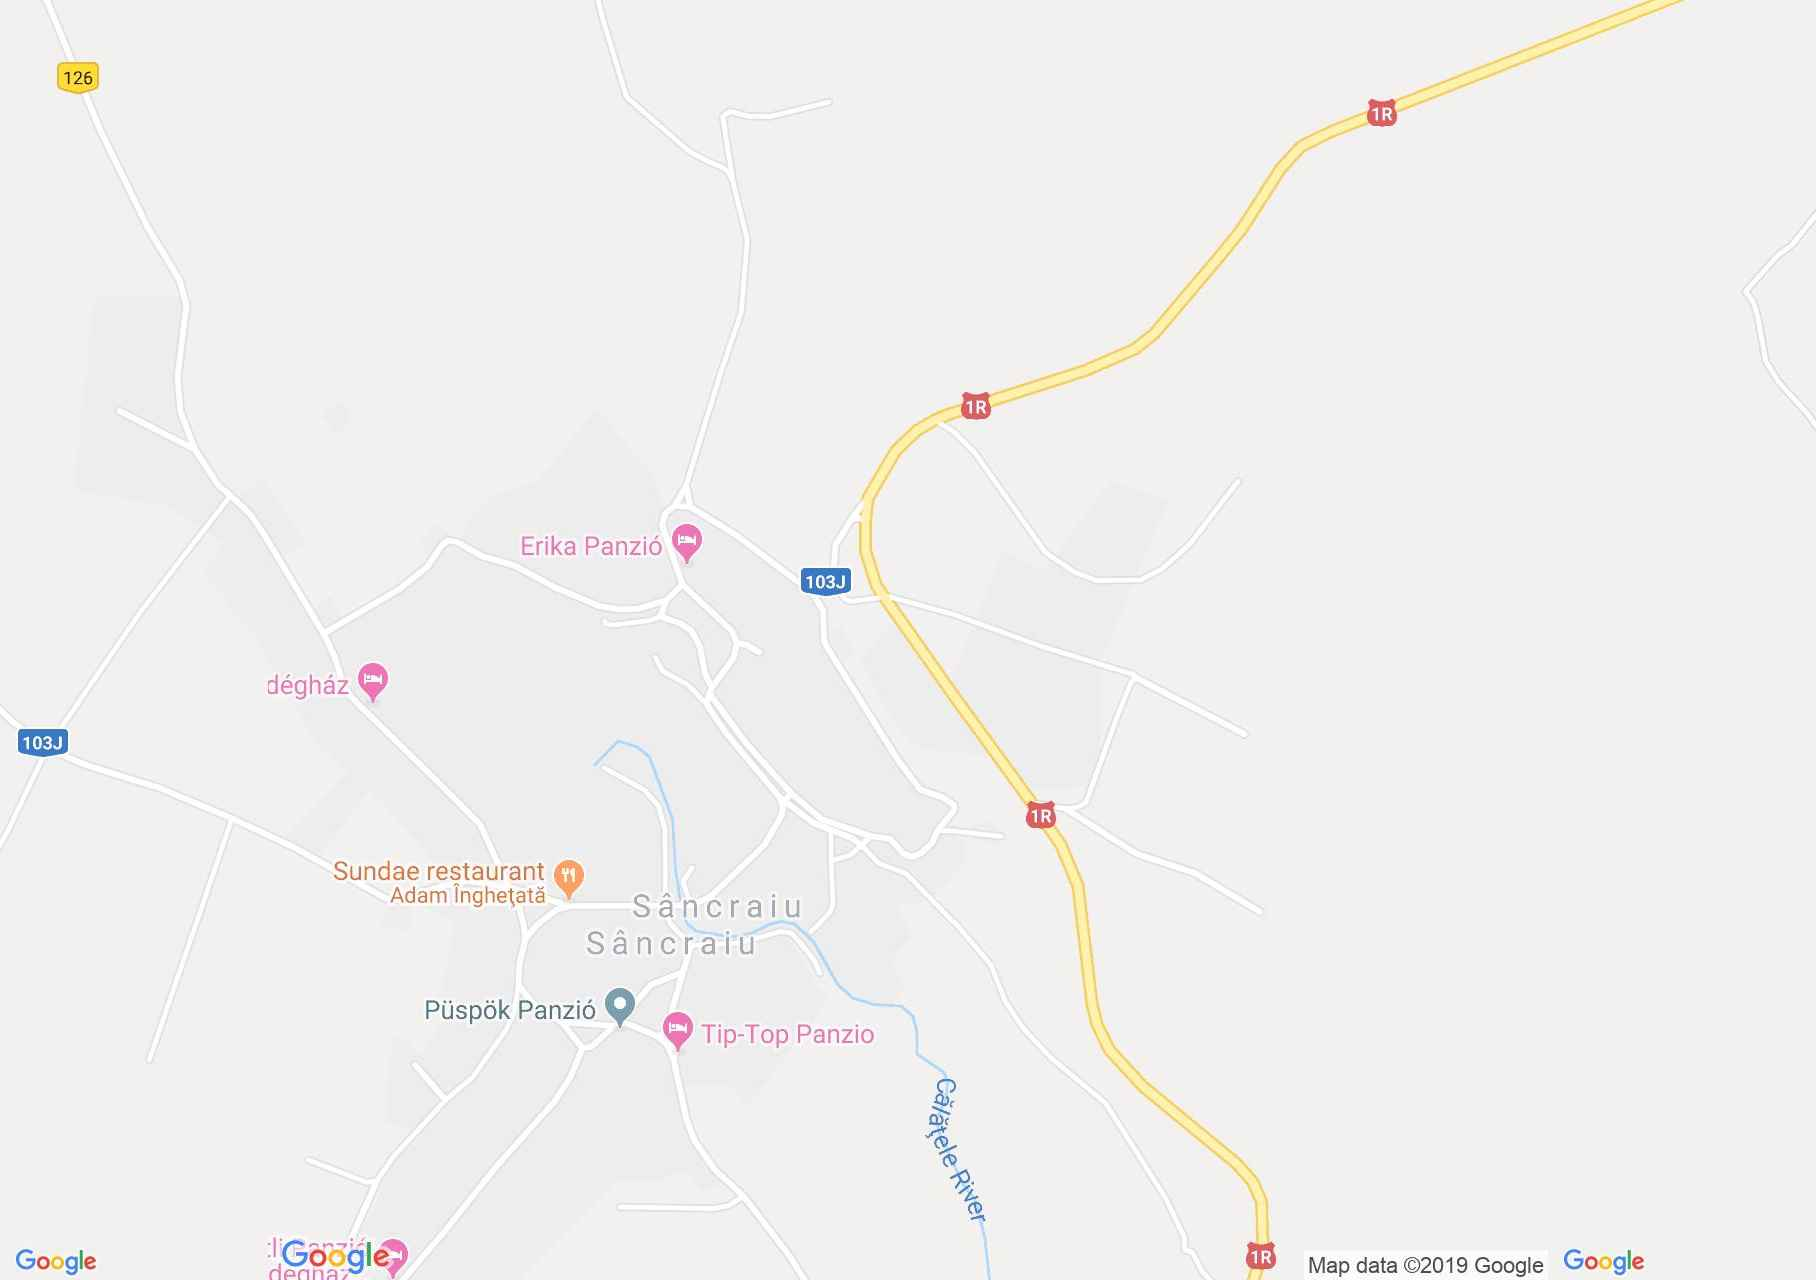 Map of Sâncraiu: Monika pension